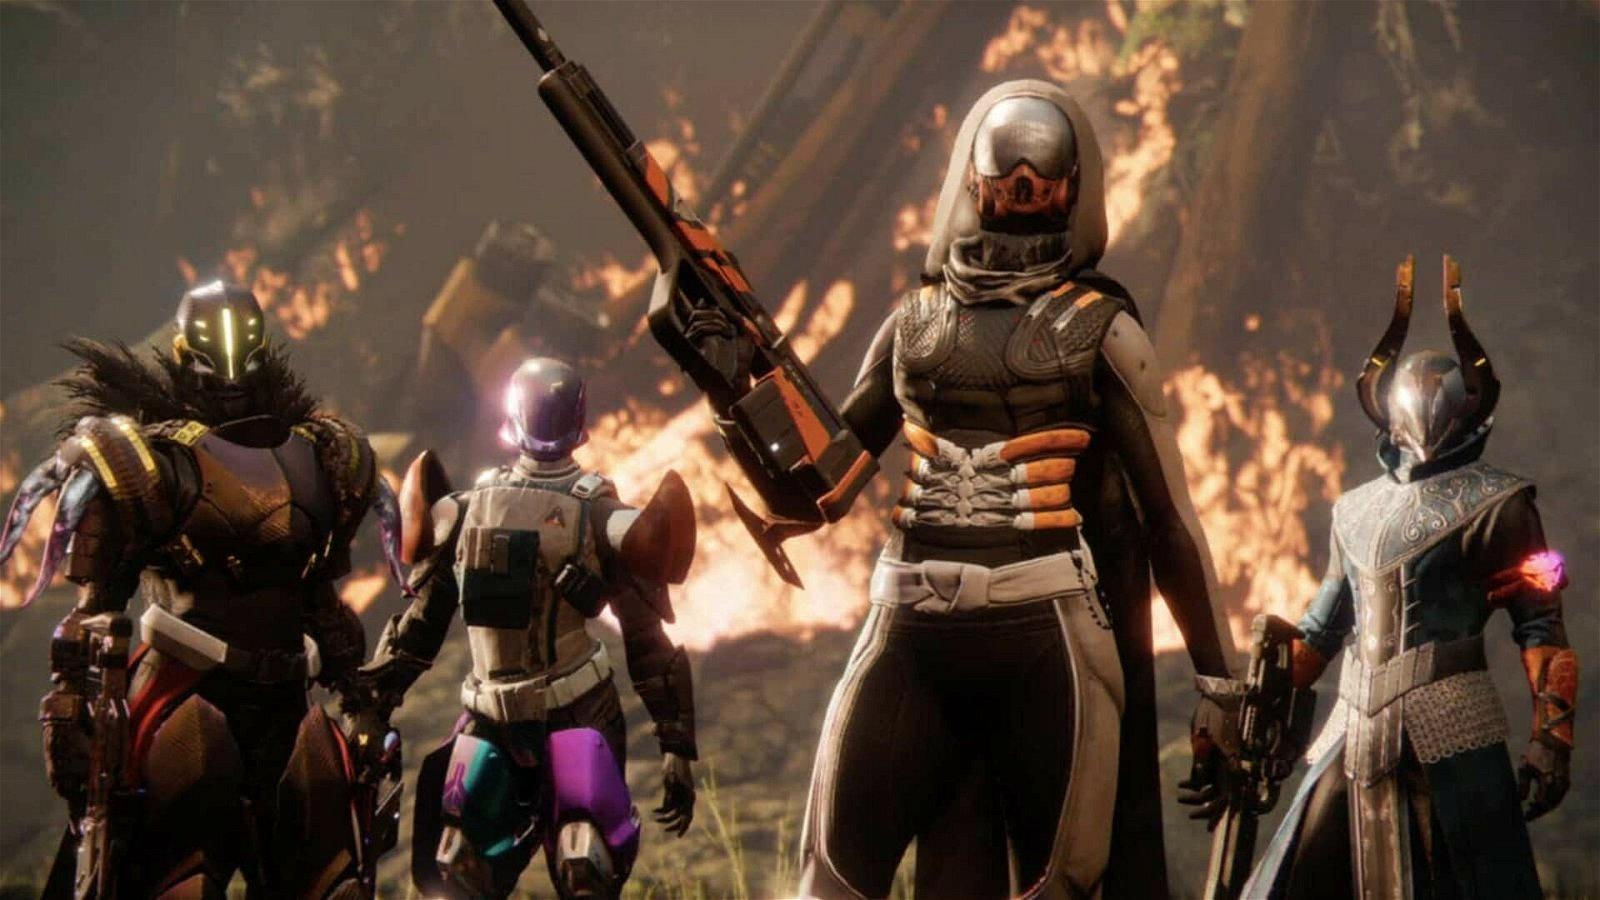 Destiny 2 Leak Is Getting BattlEye Anti-Cheat for PvP